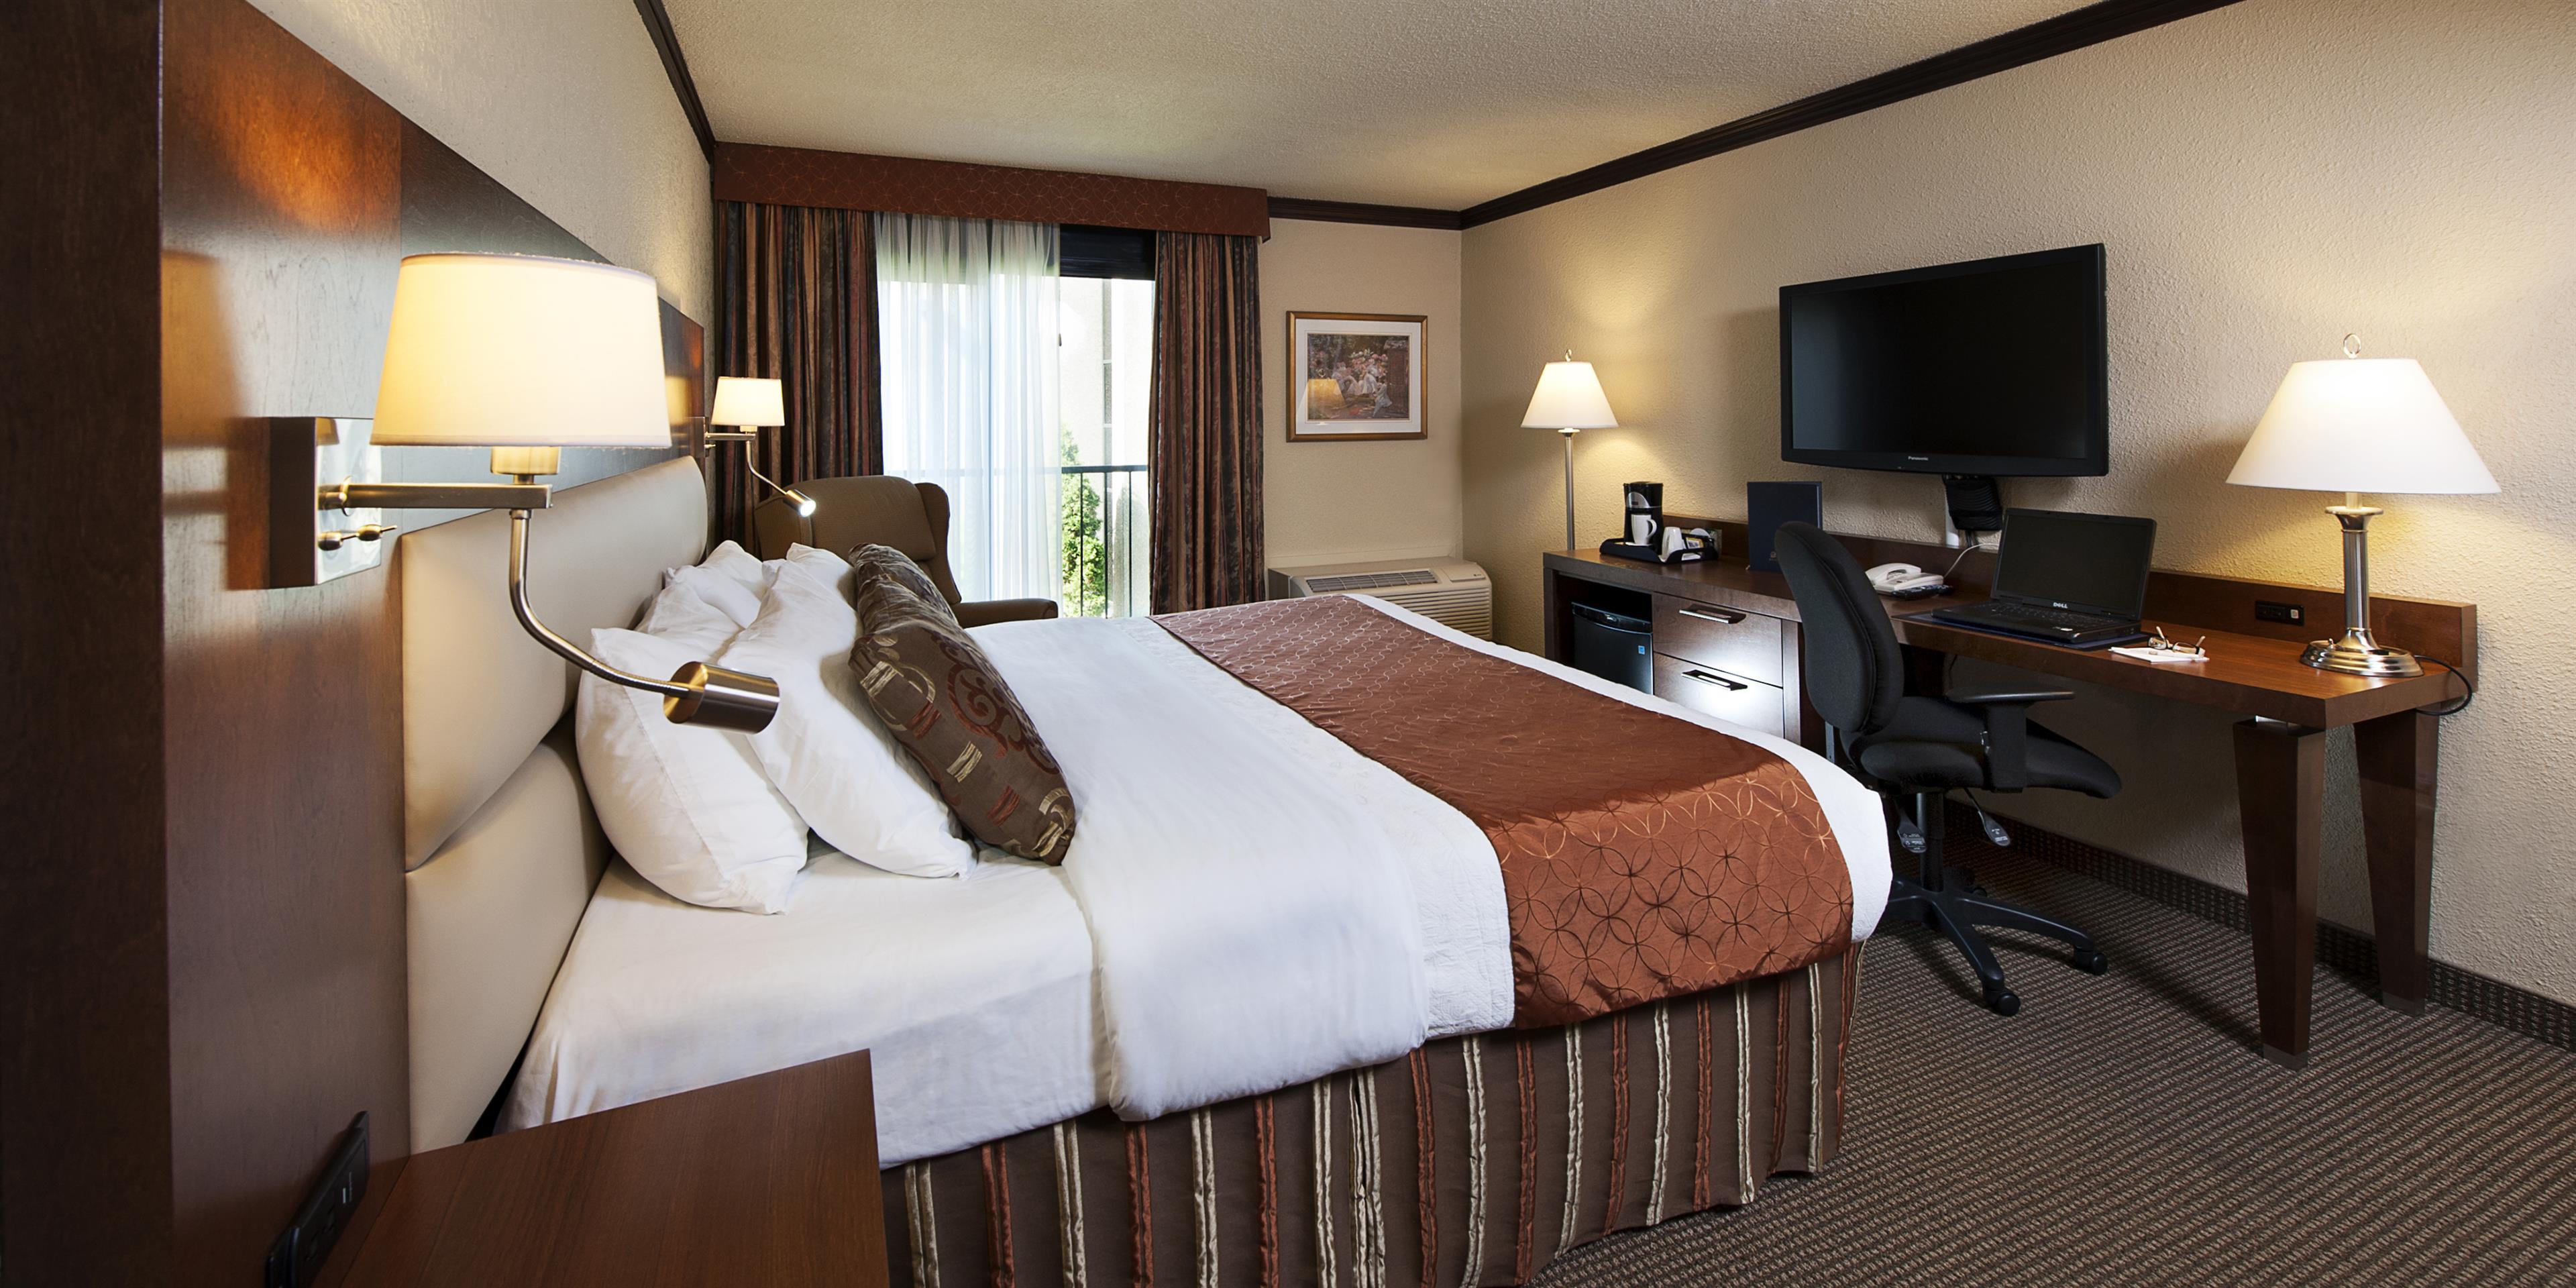 Best Western Hotel Universel Drummondville à Drummondville: King Mobility Accessible